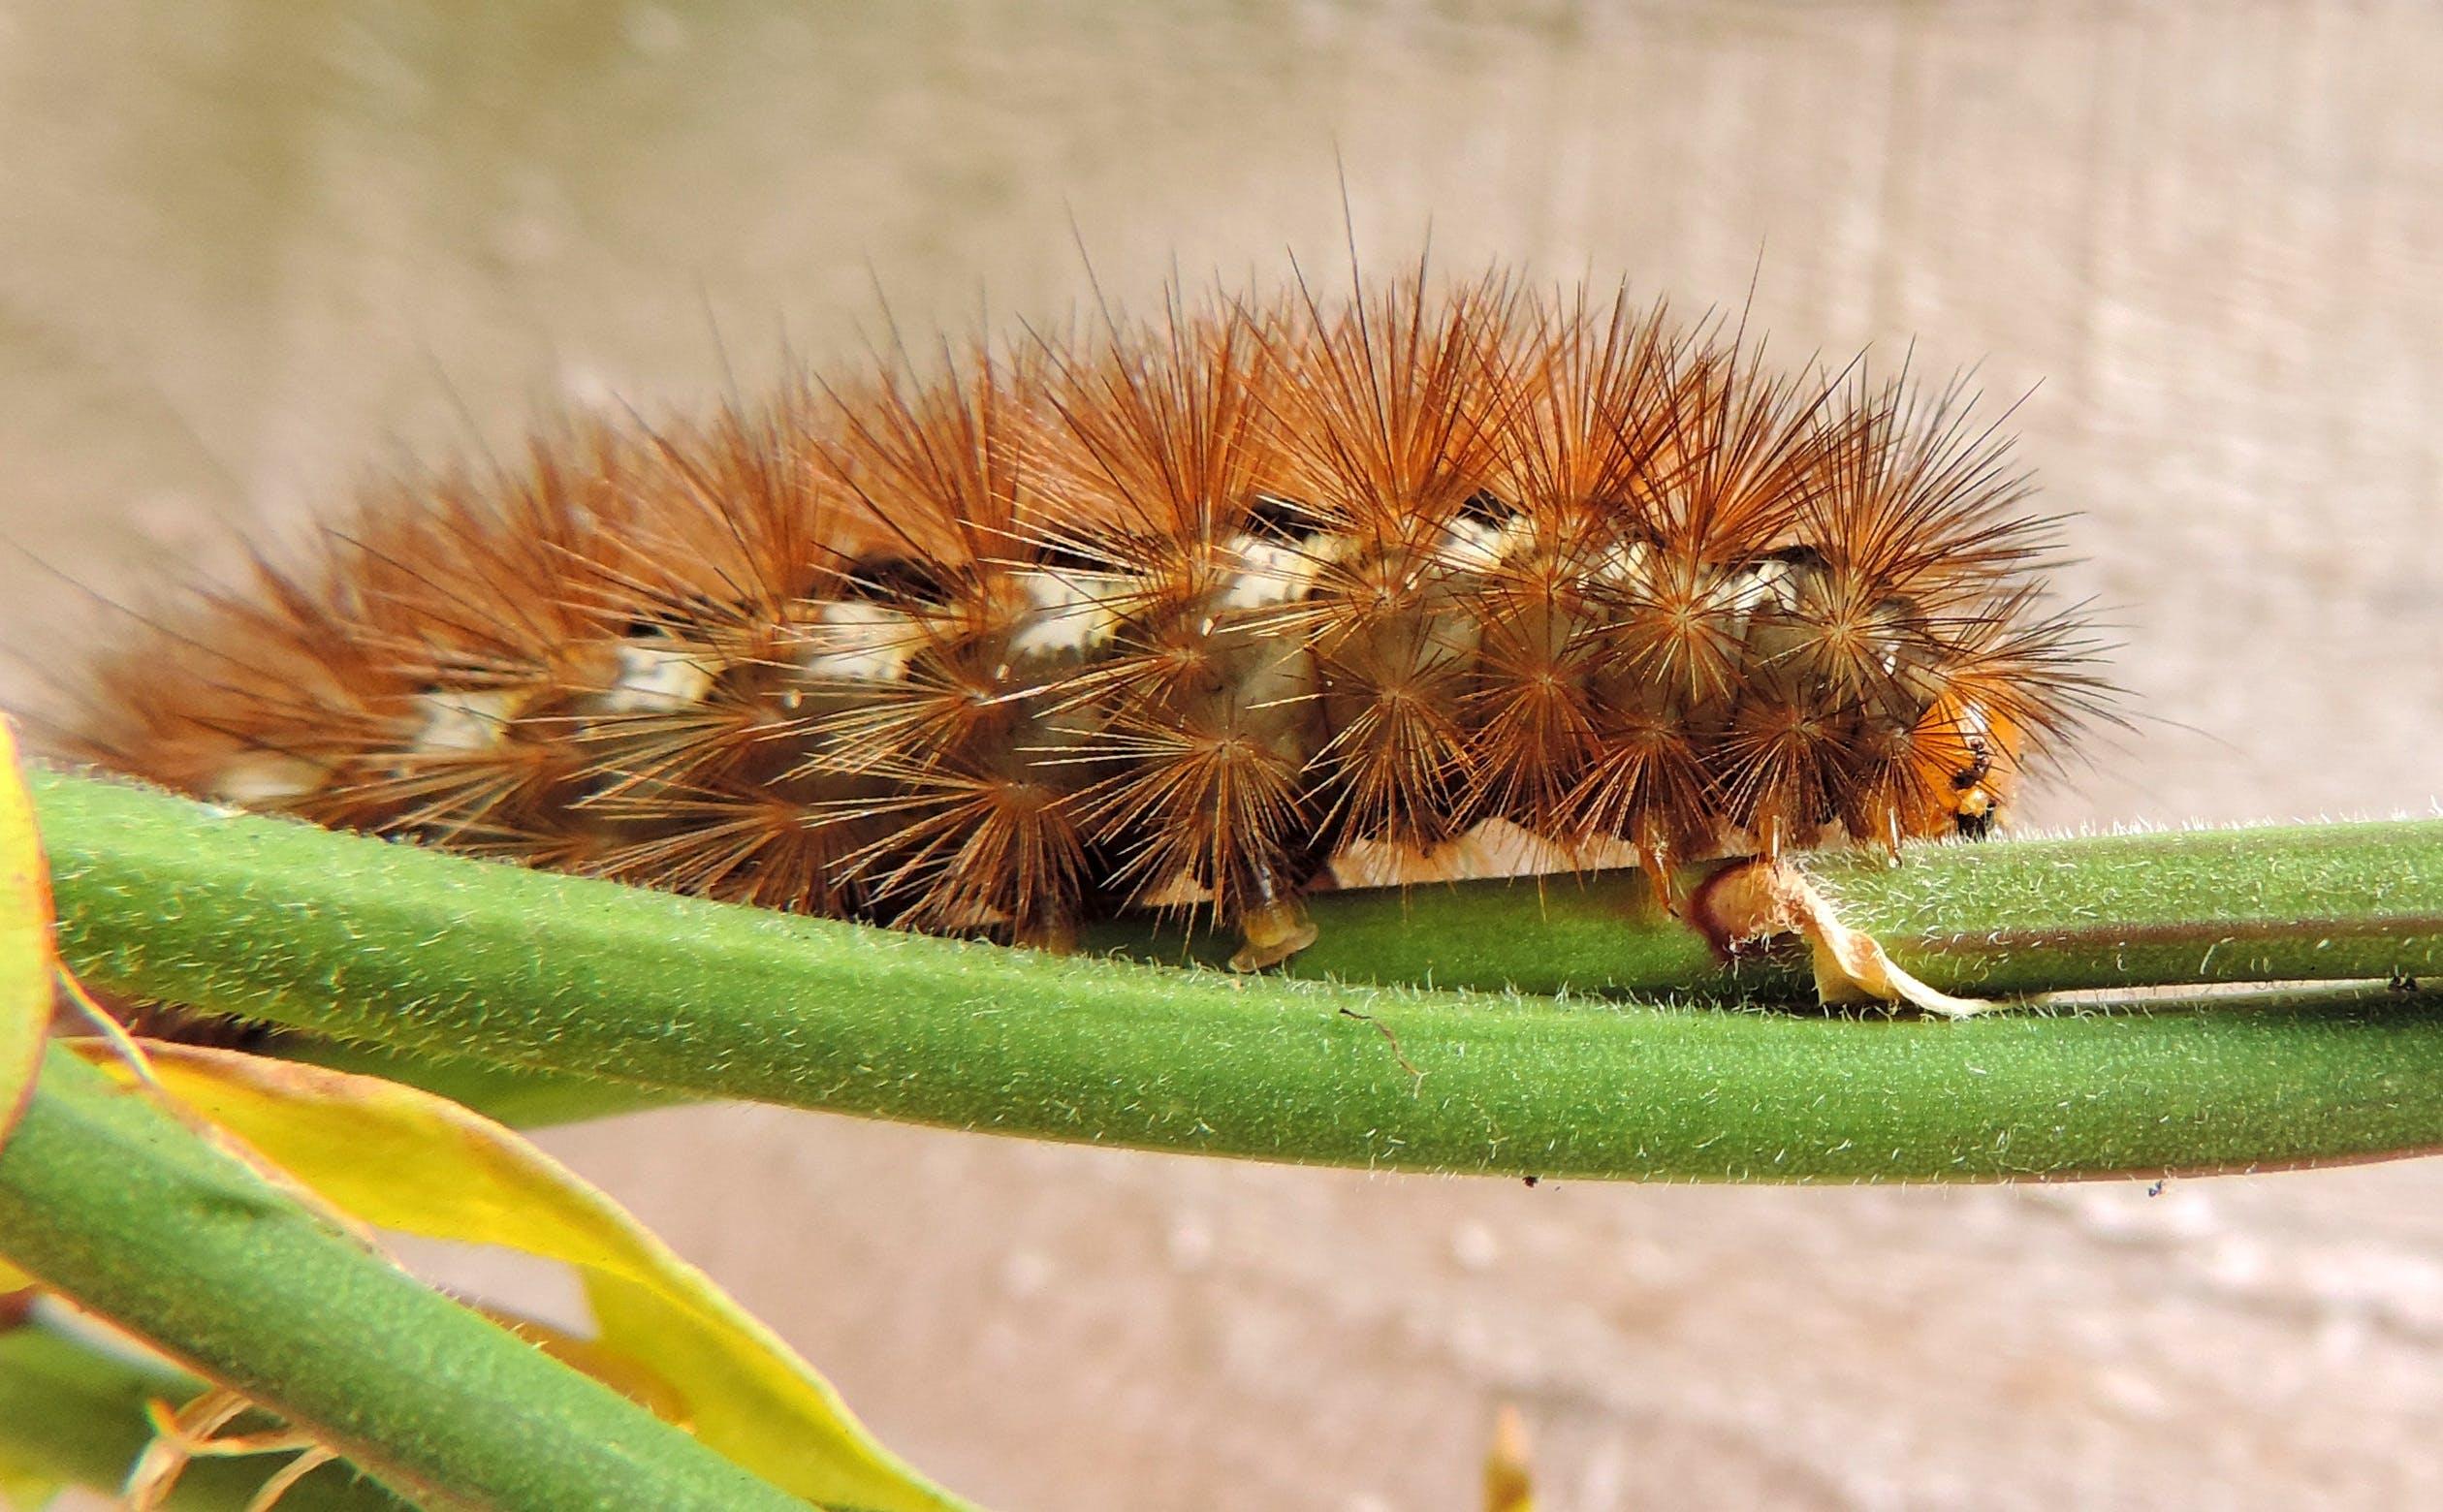 Brown Caterpillar on Plant Stem